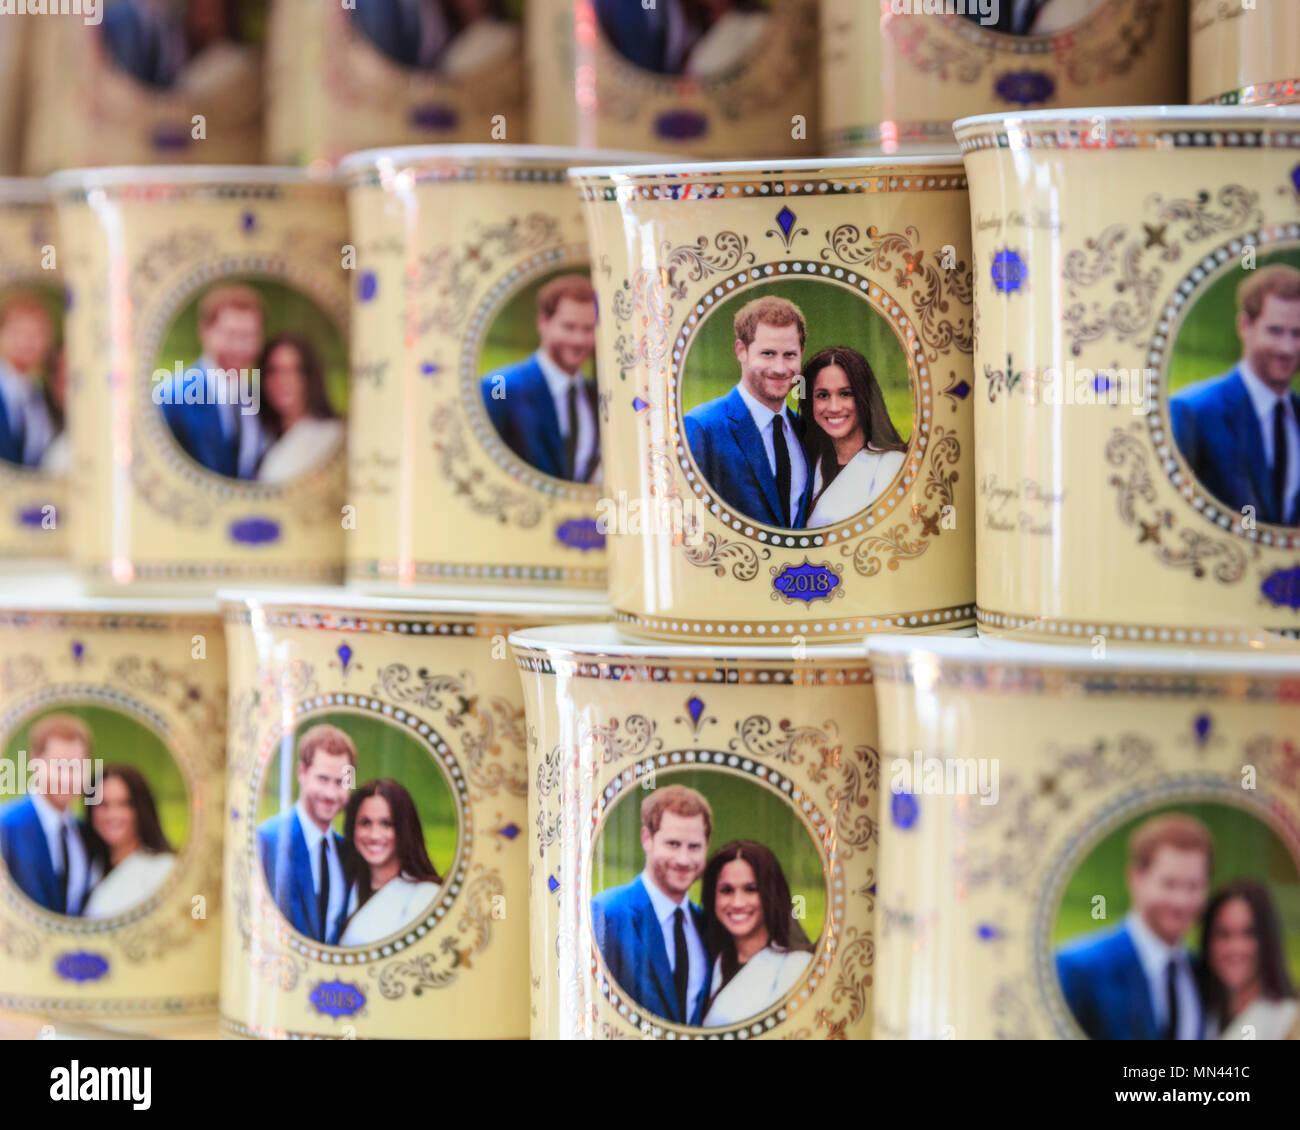 Prince Mugs Markle Harry Photosamp; And Meghan qVUzSMp